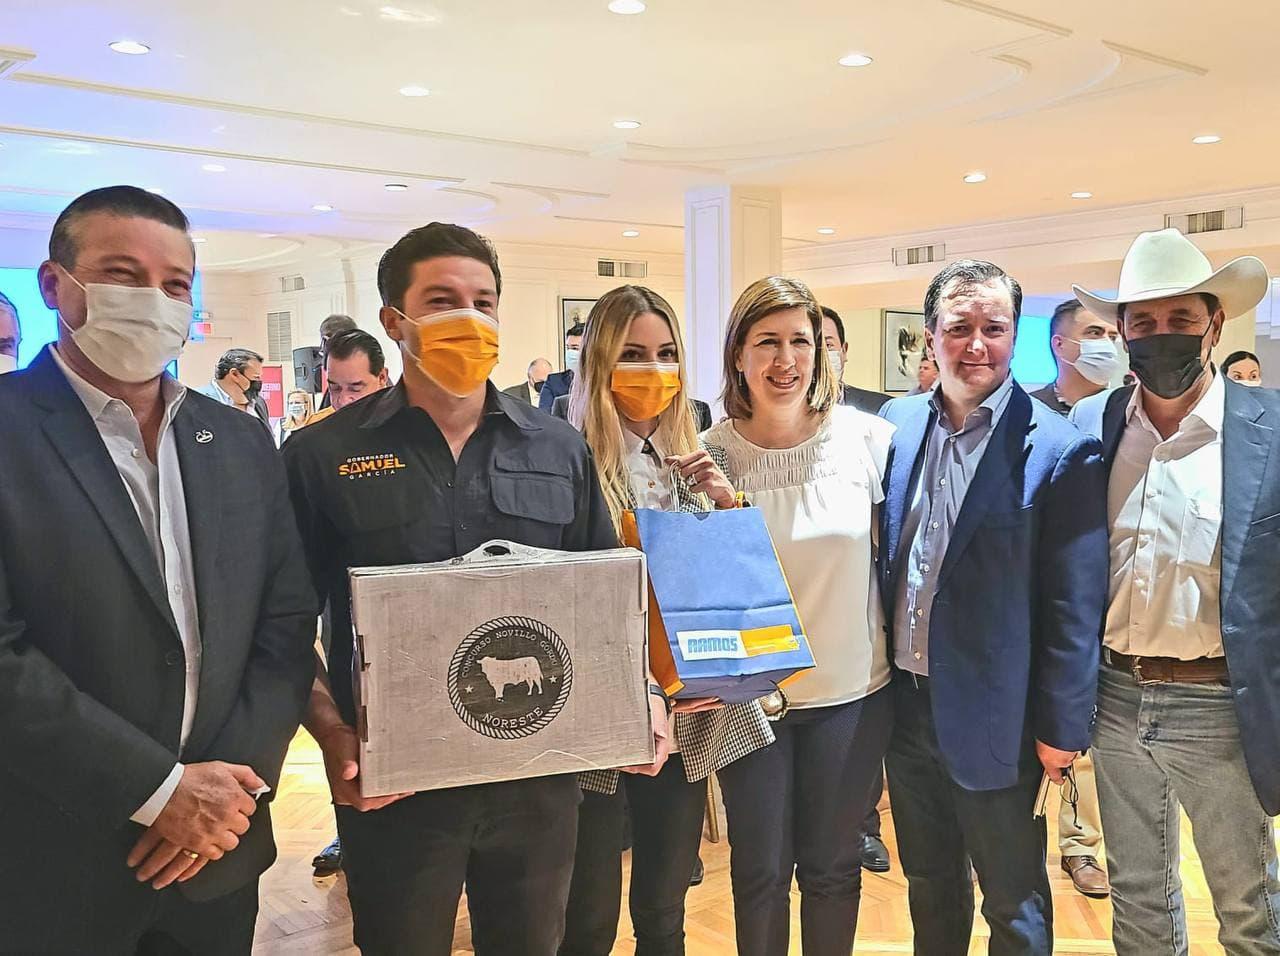 Acuerda Samuel con agropecuarios terna a Secretaría; se compromete a defender agua de NL